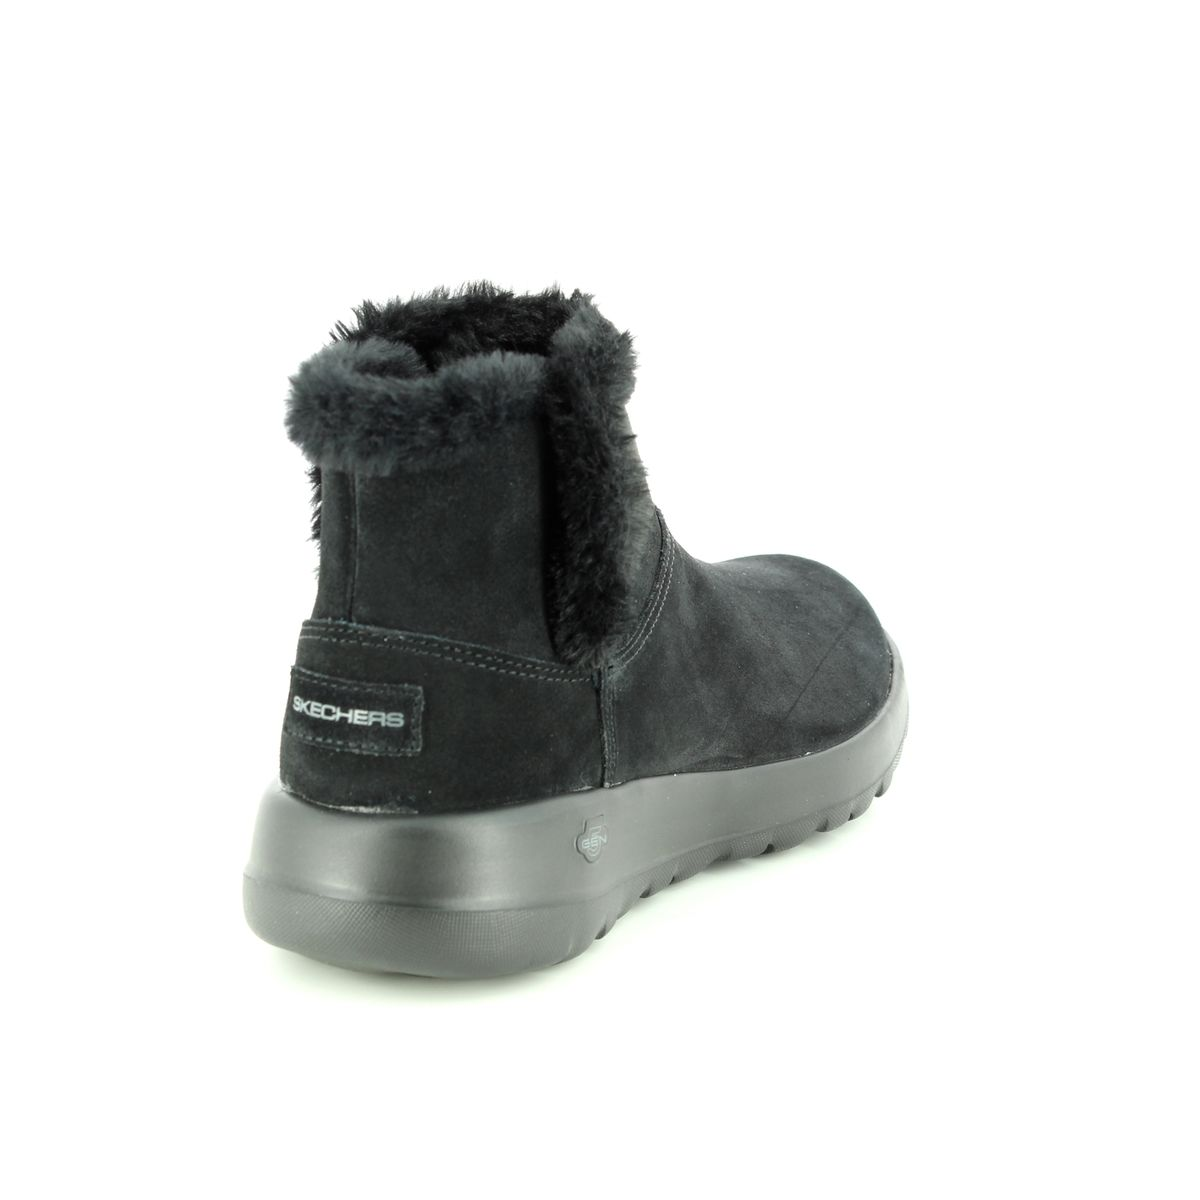 004d95871fc1 Skechers On The Go Joy 15501 BBK Black ankle boots